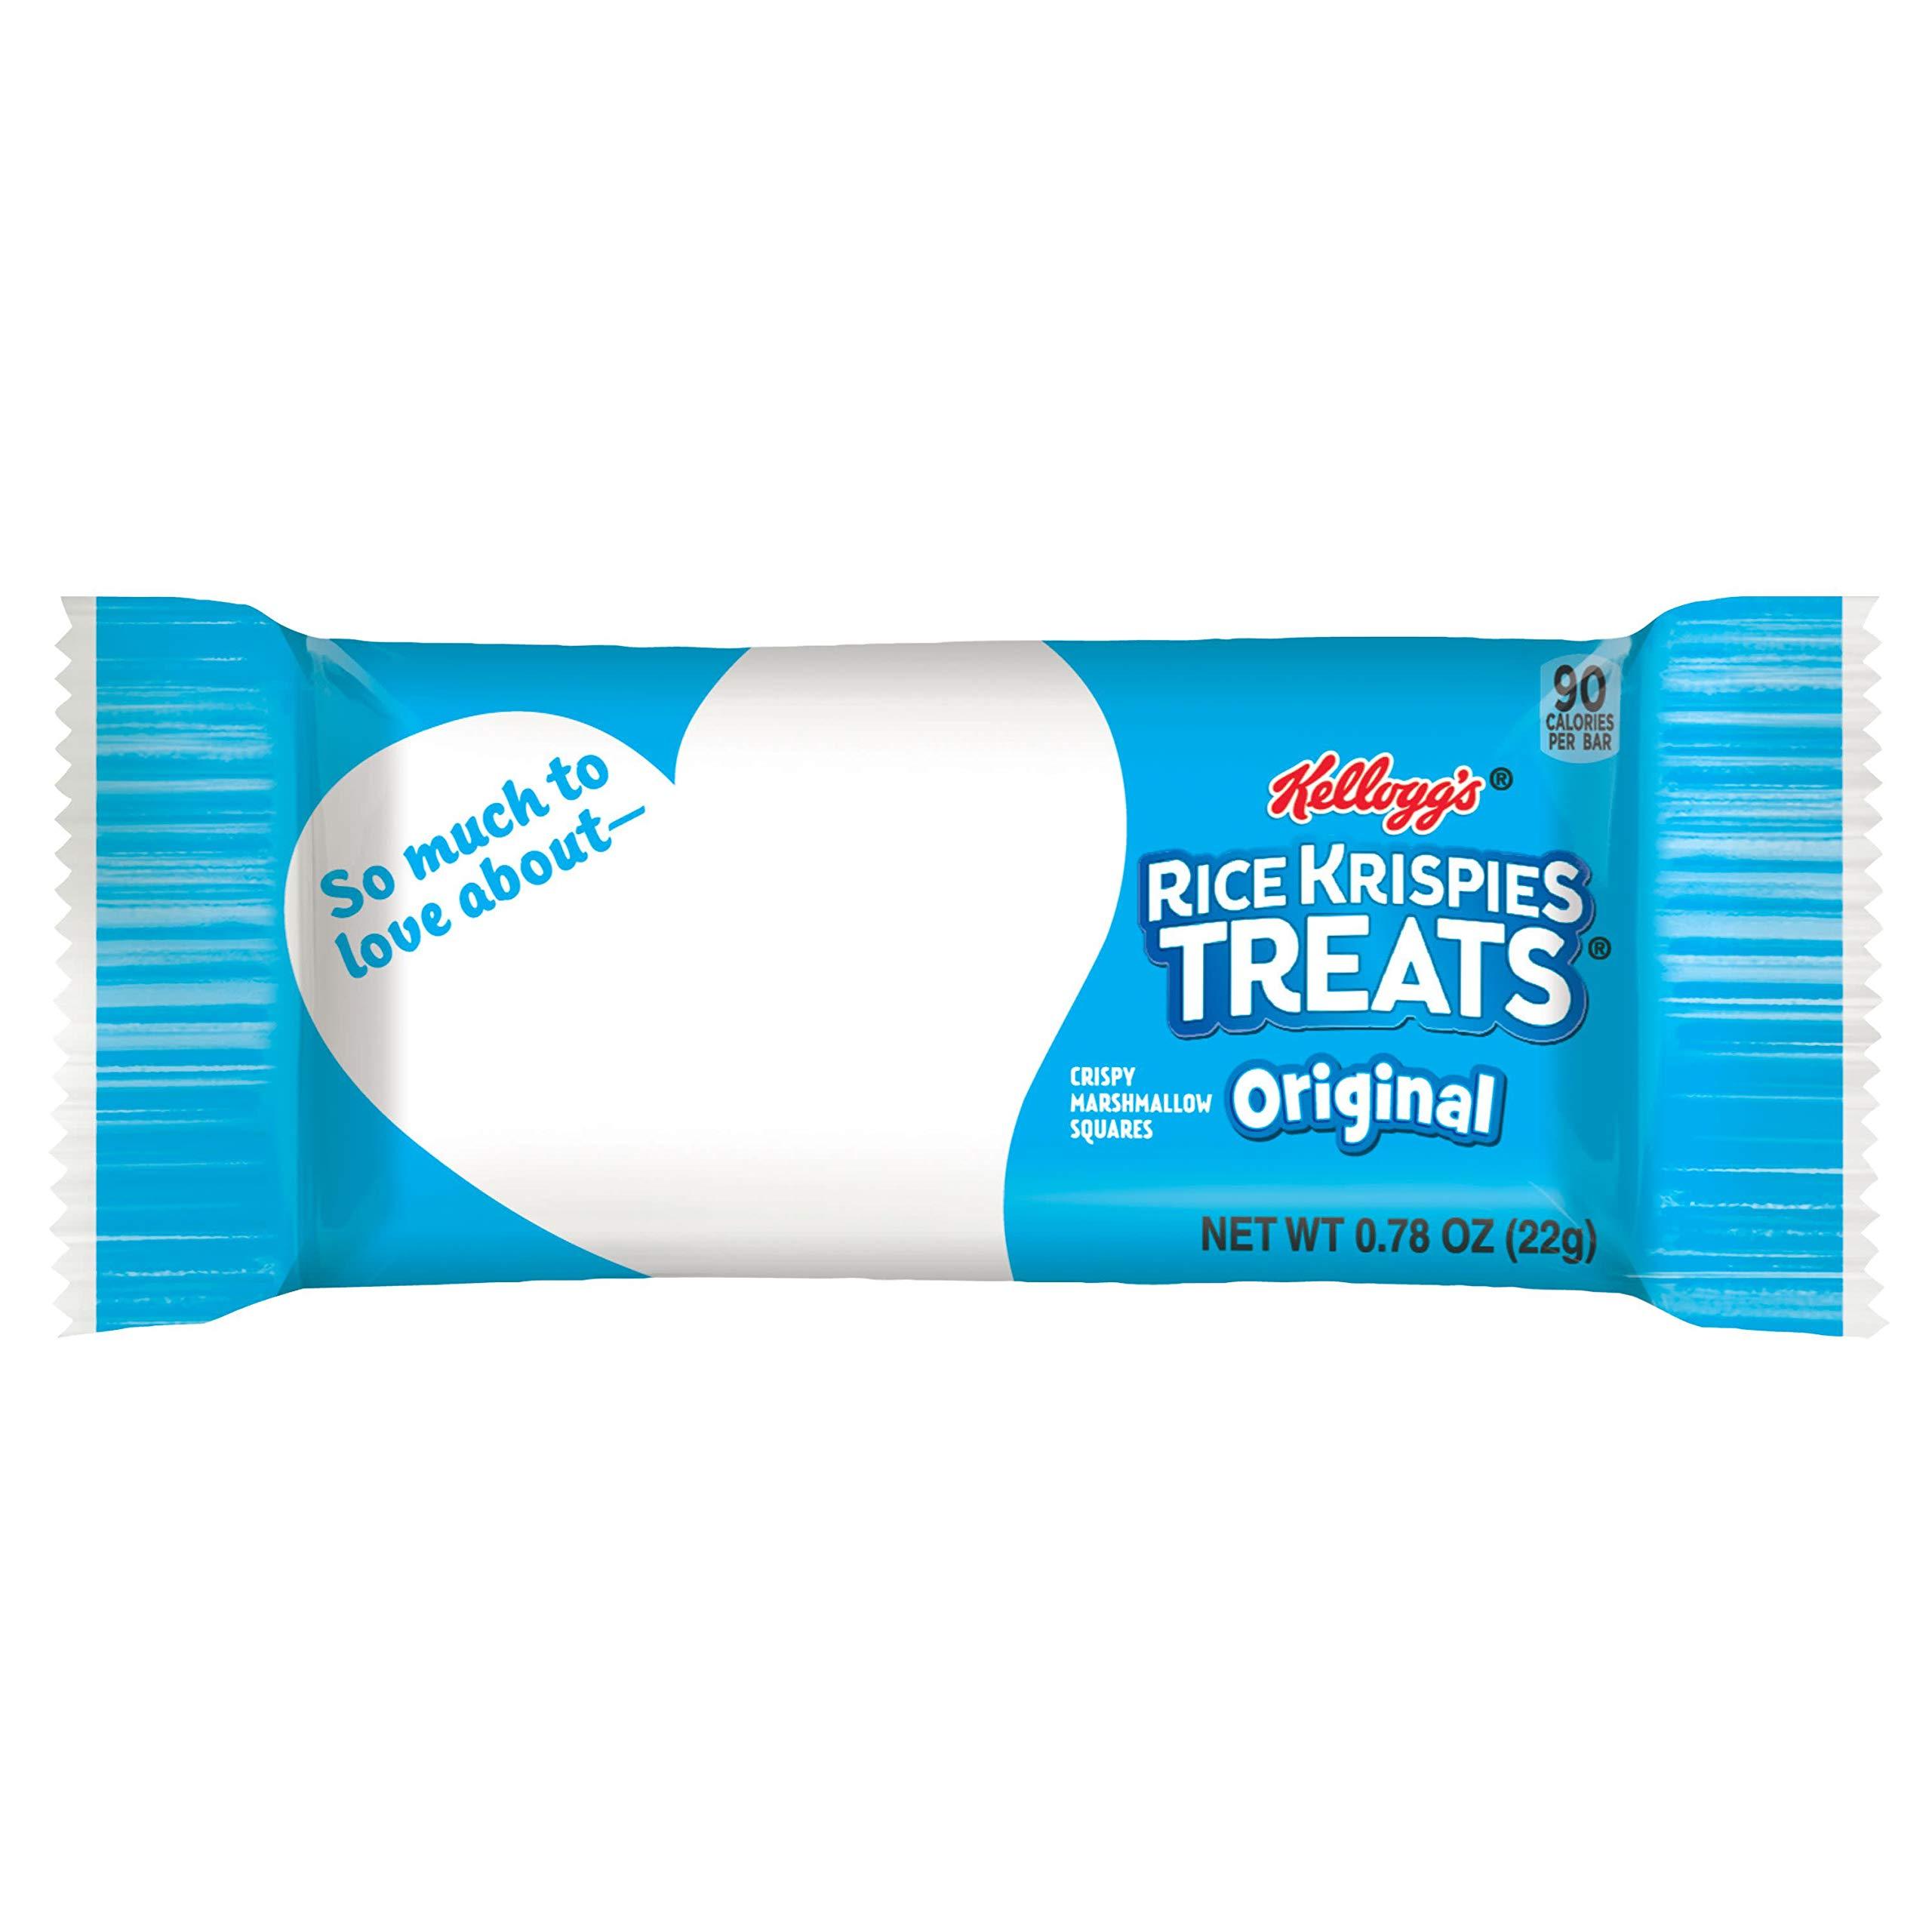 Kellogg's Rice Krispies Treats, Crispy Marshmallow Squares, Original, Value Pack, 0.78 oz Bars(16 Count) by Rice Krispies (Image #10)